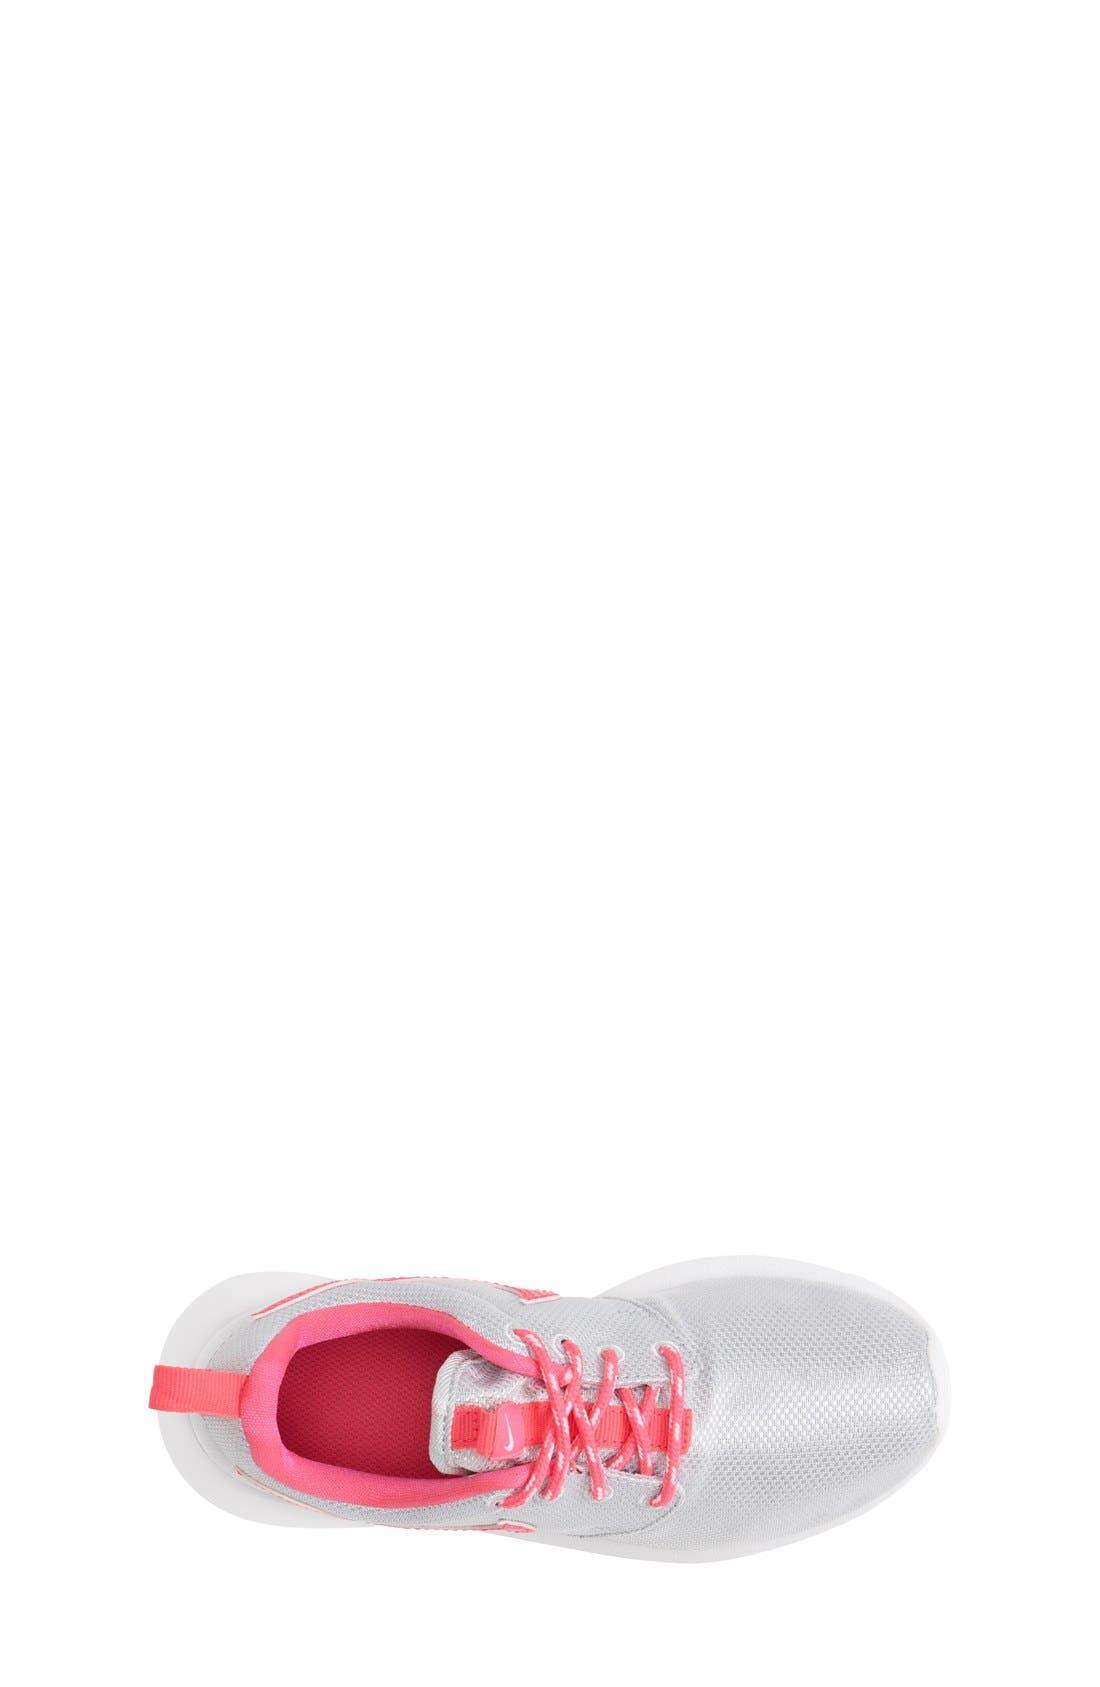 'Roshe Run' Athletic Shoe,                             Alternate thumbnail 80, color,